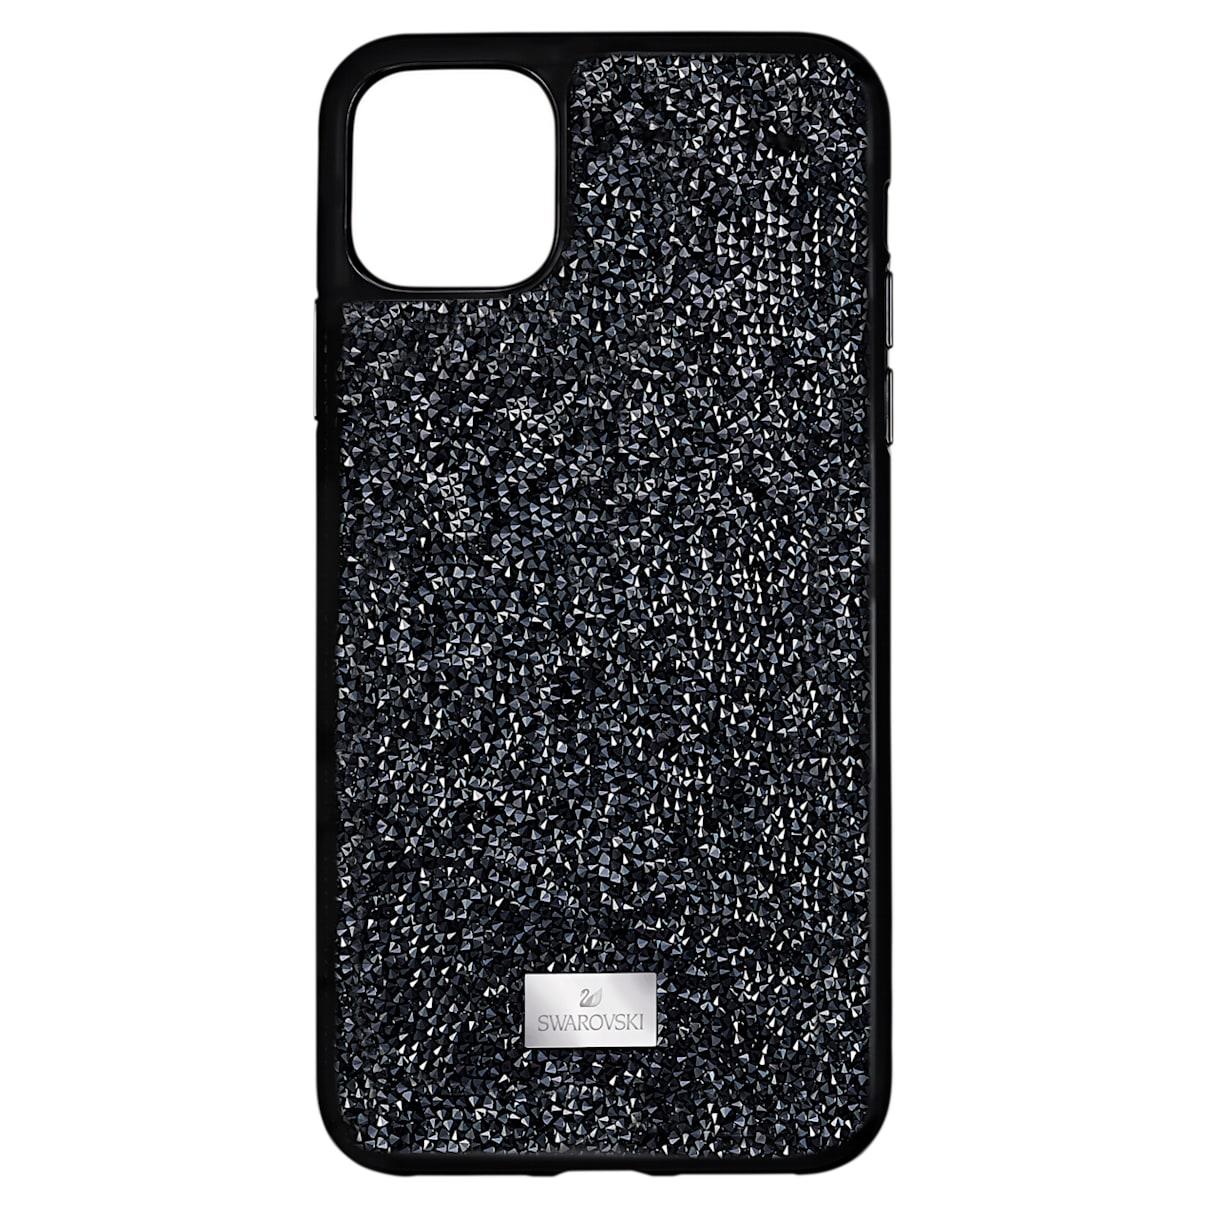 Custodia per smartphone Glam Rock, iPhone® 12/12 Pro, nero